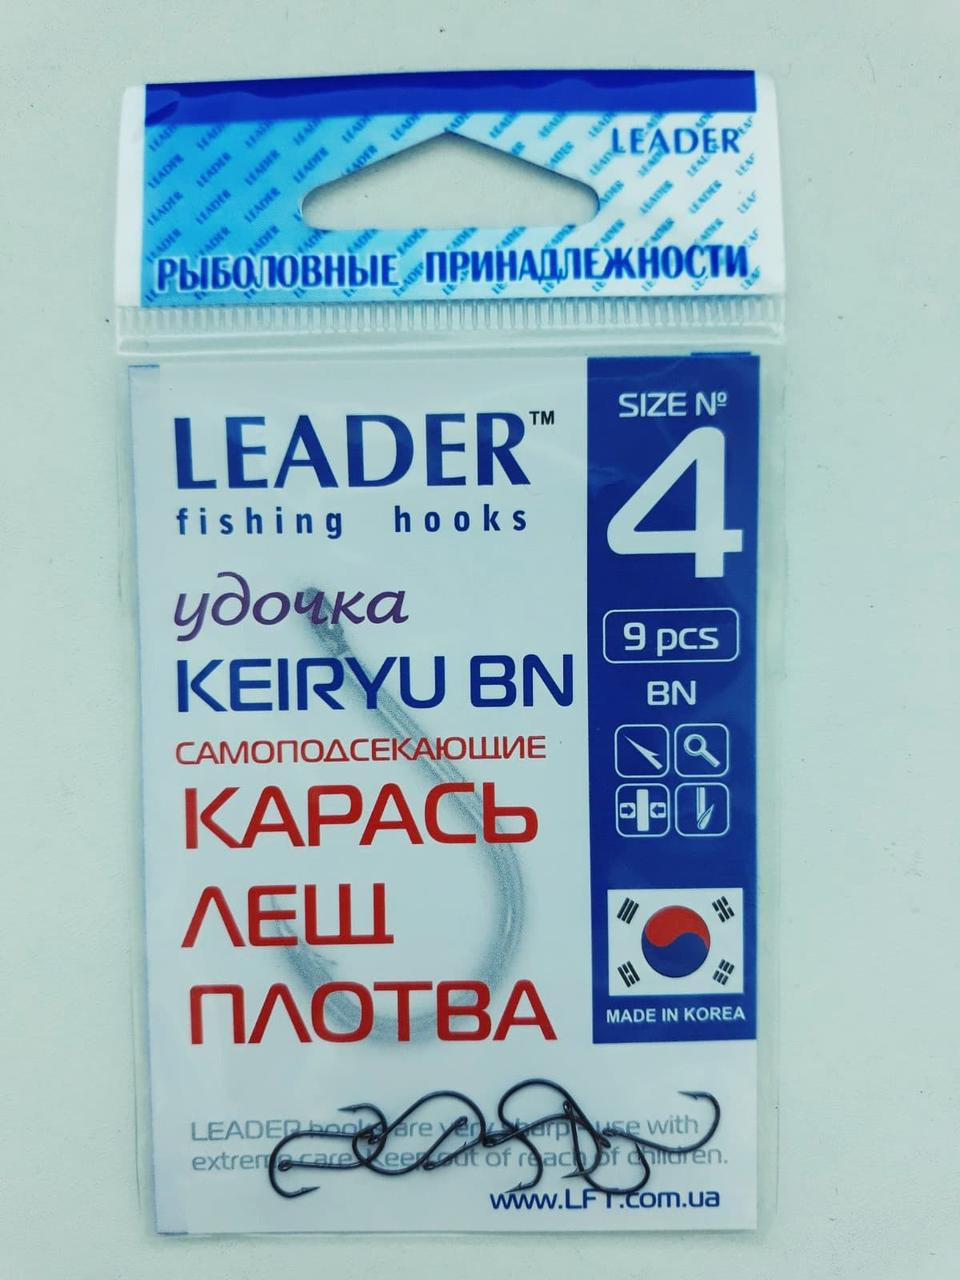 Крючок Leader KEIRYU BN самоподсекающие № 4